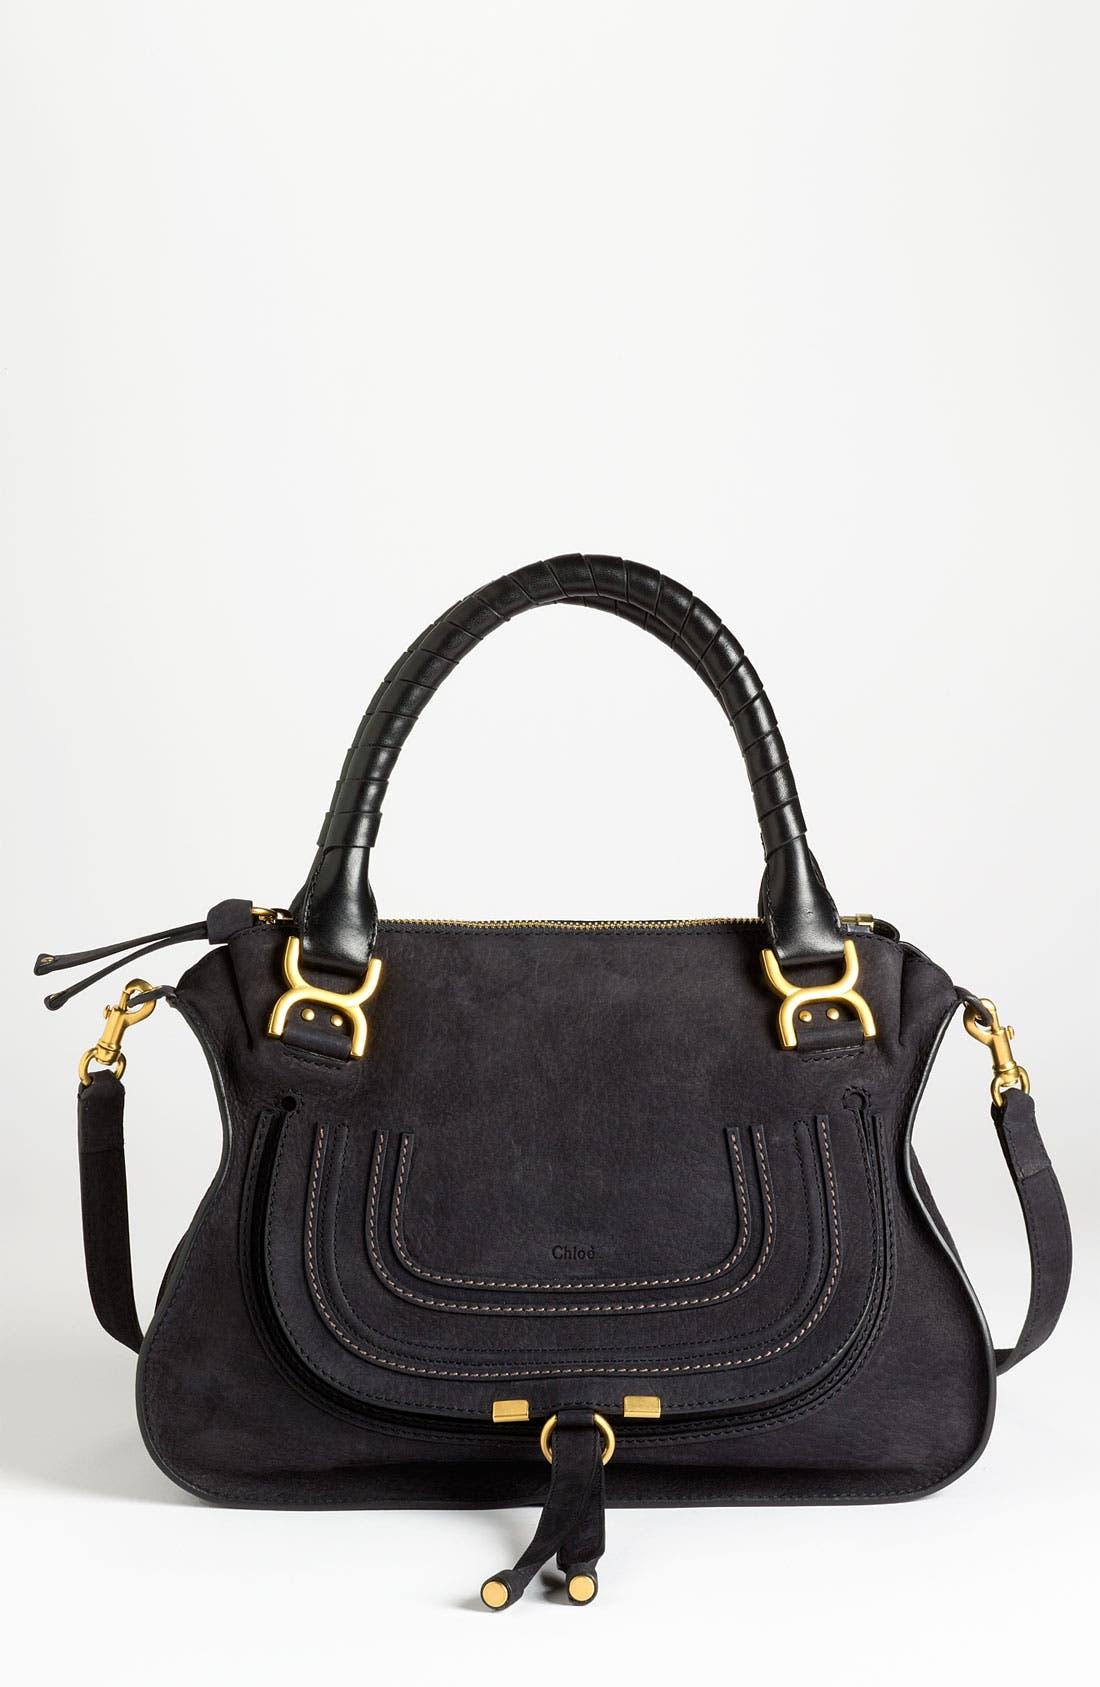 Alternate Image 1 Selected - Chloé 'Marcie -Small' Nubuck Leather Shoulder Bag